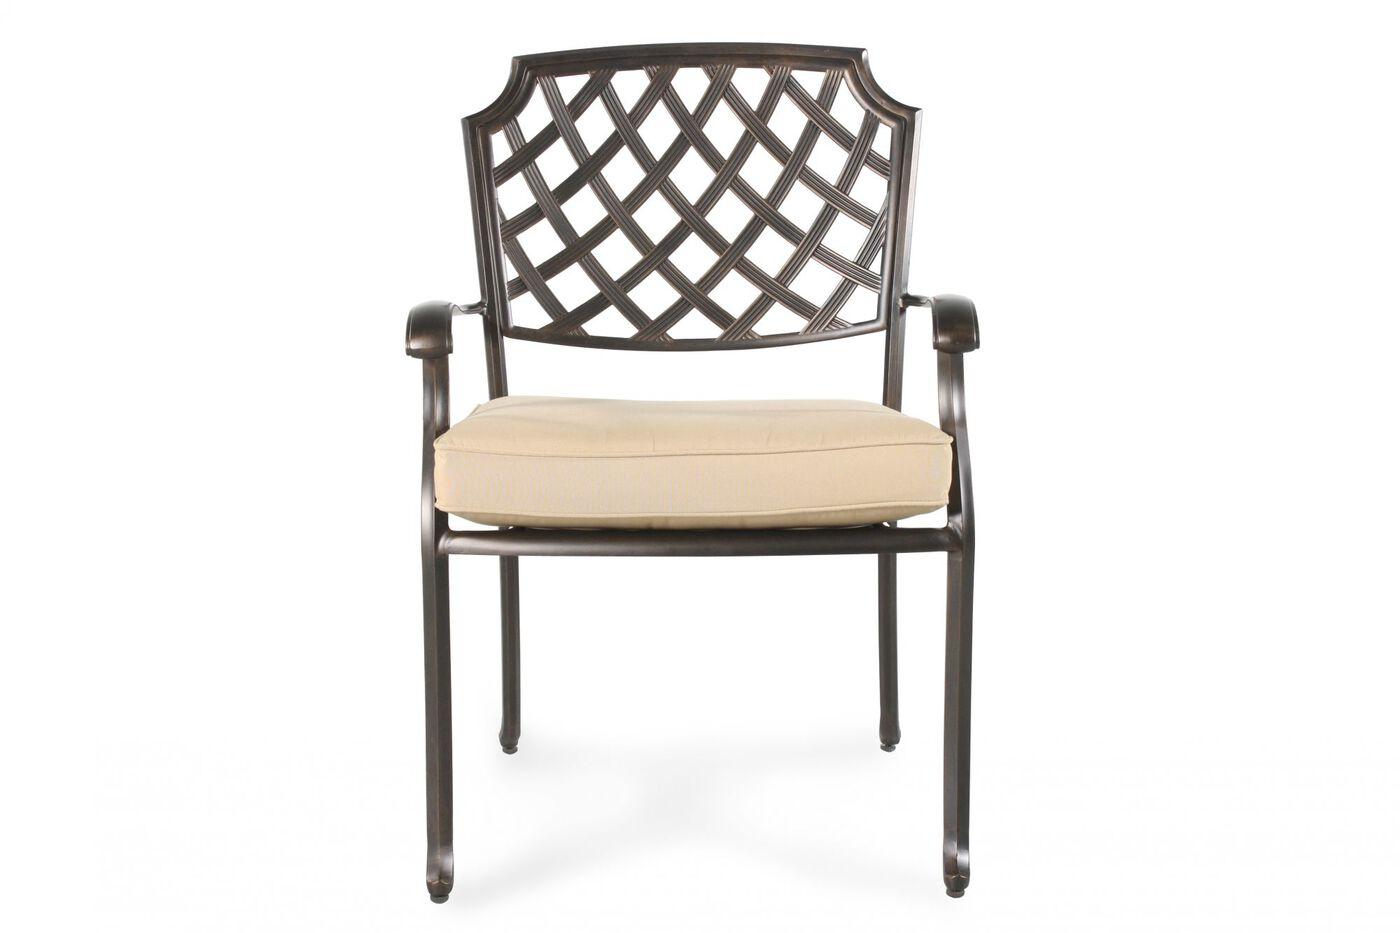 Lattice-Back Aluminum Patio Dining Chair In Brown